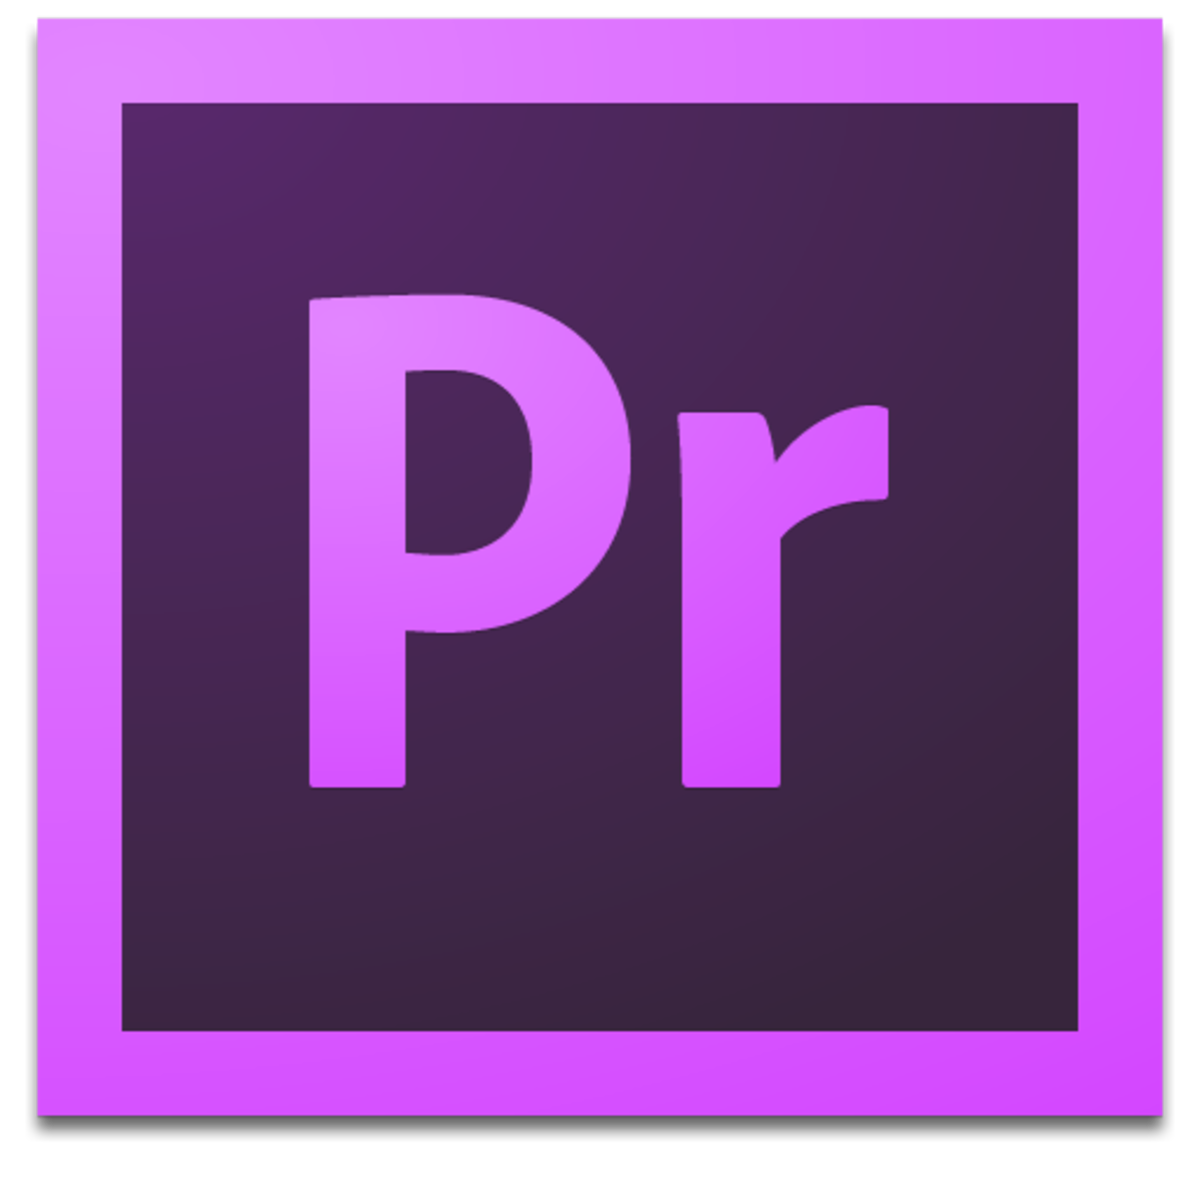 Adobe 公司全系列软件套装单装MACWIN附中文化程序  LookAEcom